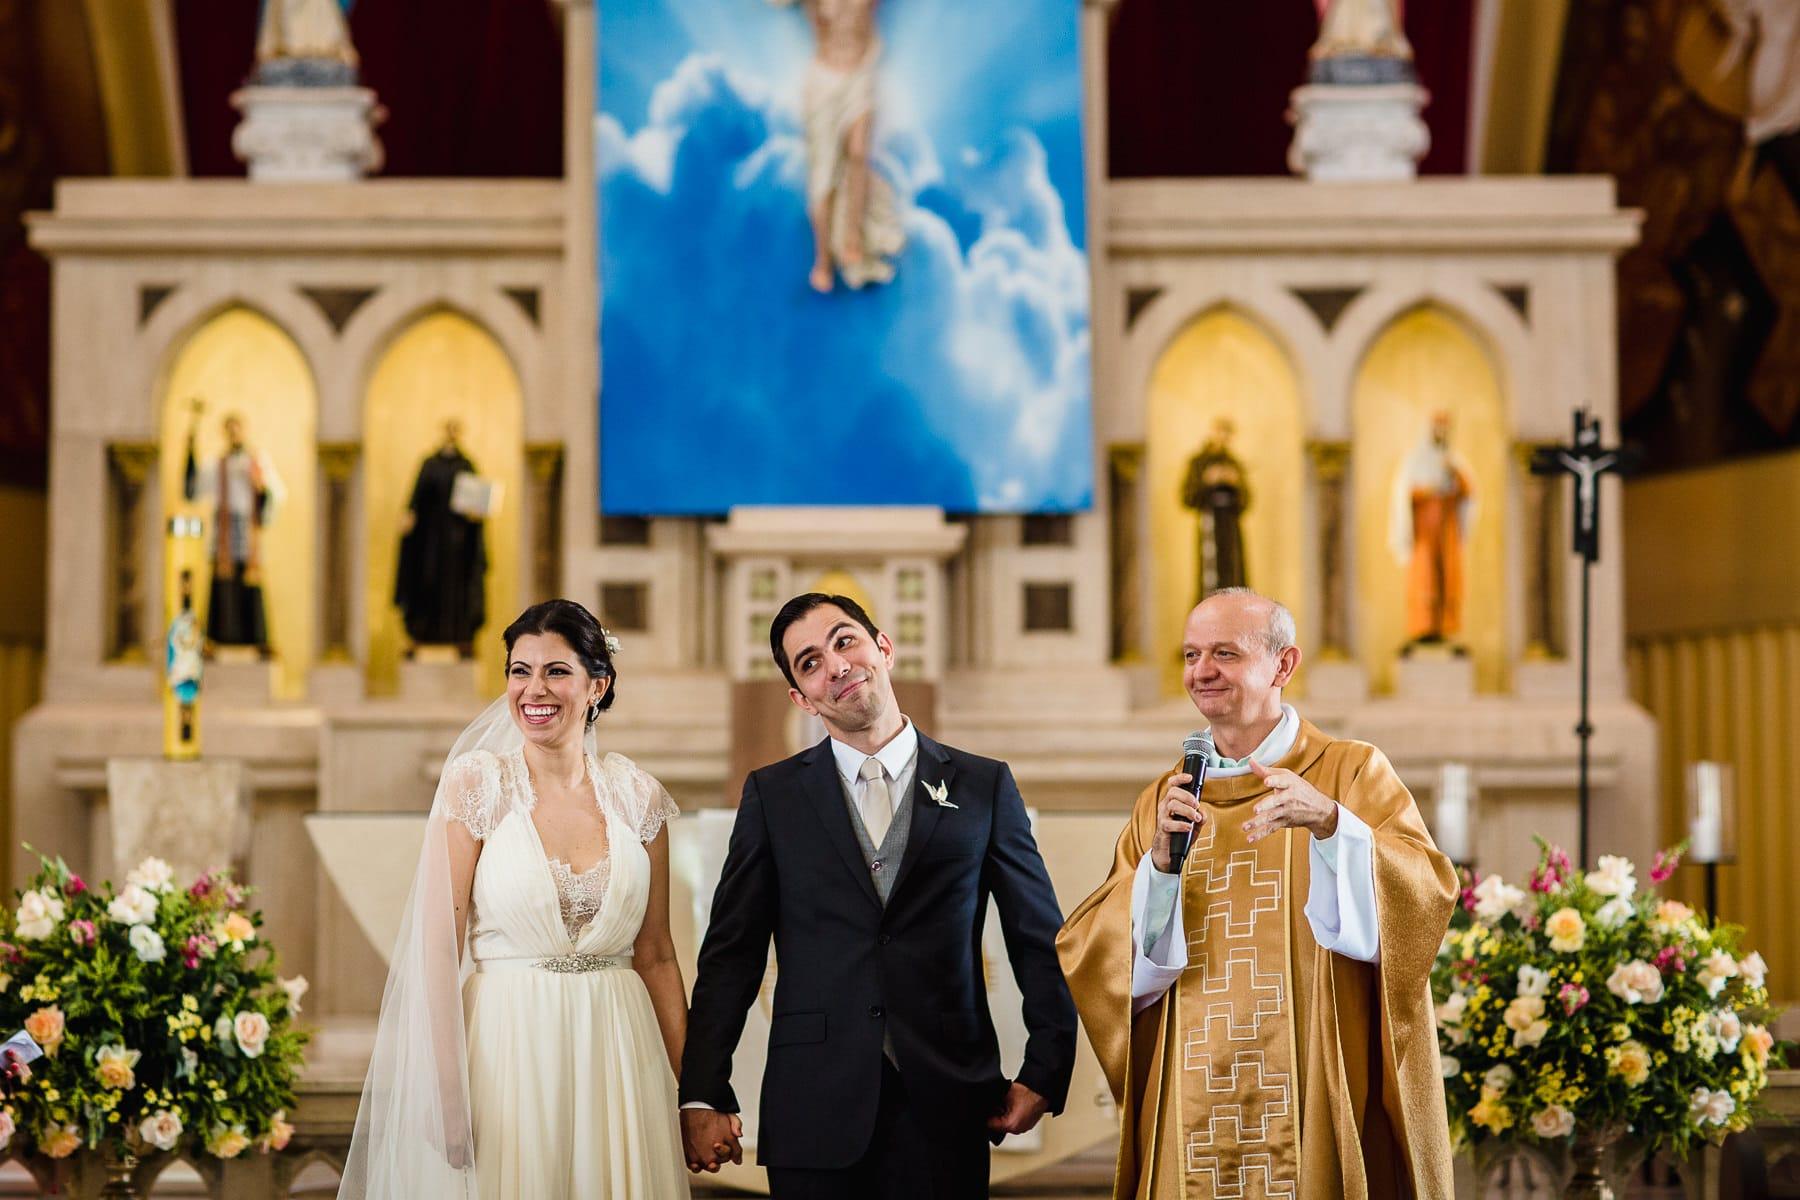 casamento-igreja-do-cristo-rei-fortaleza-35